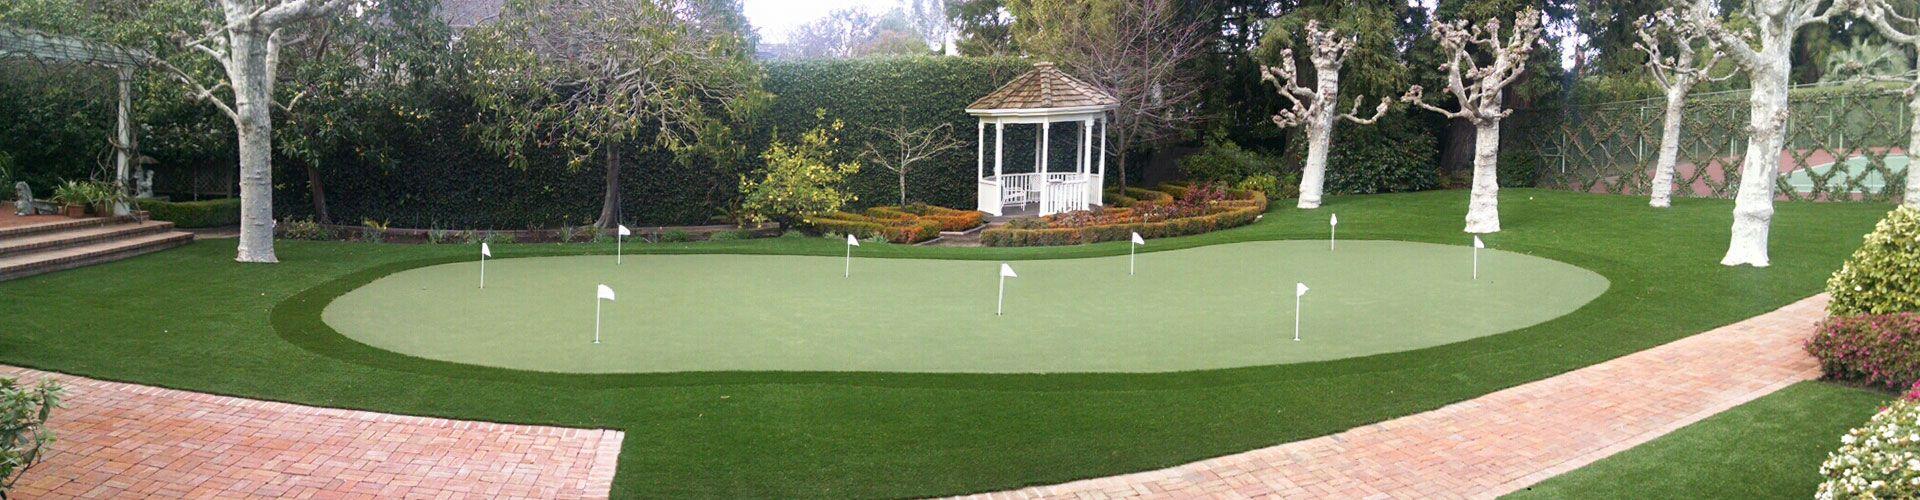 Pin by CJ McDaniel on Backyard Putting Green Ideas ...